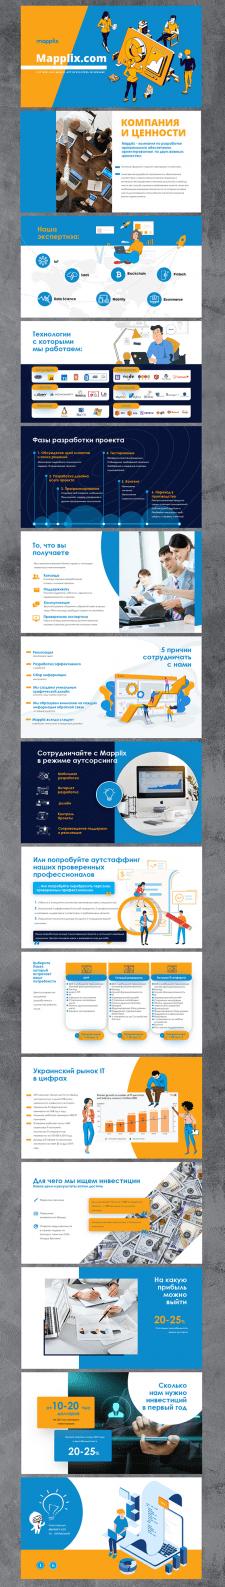 Digital agency презентация